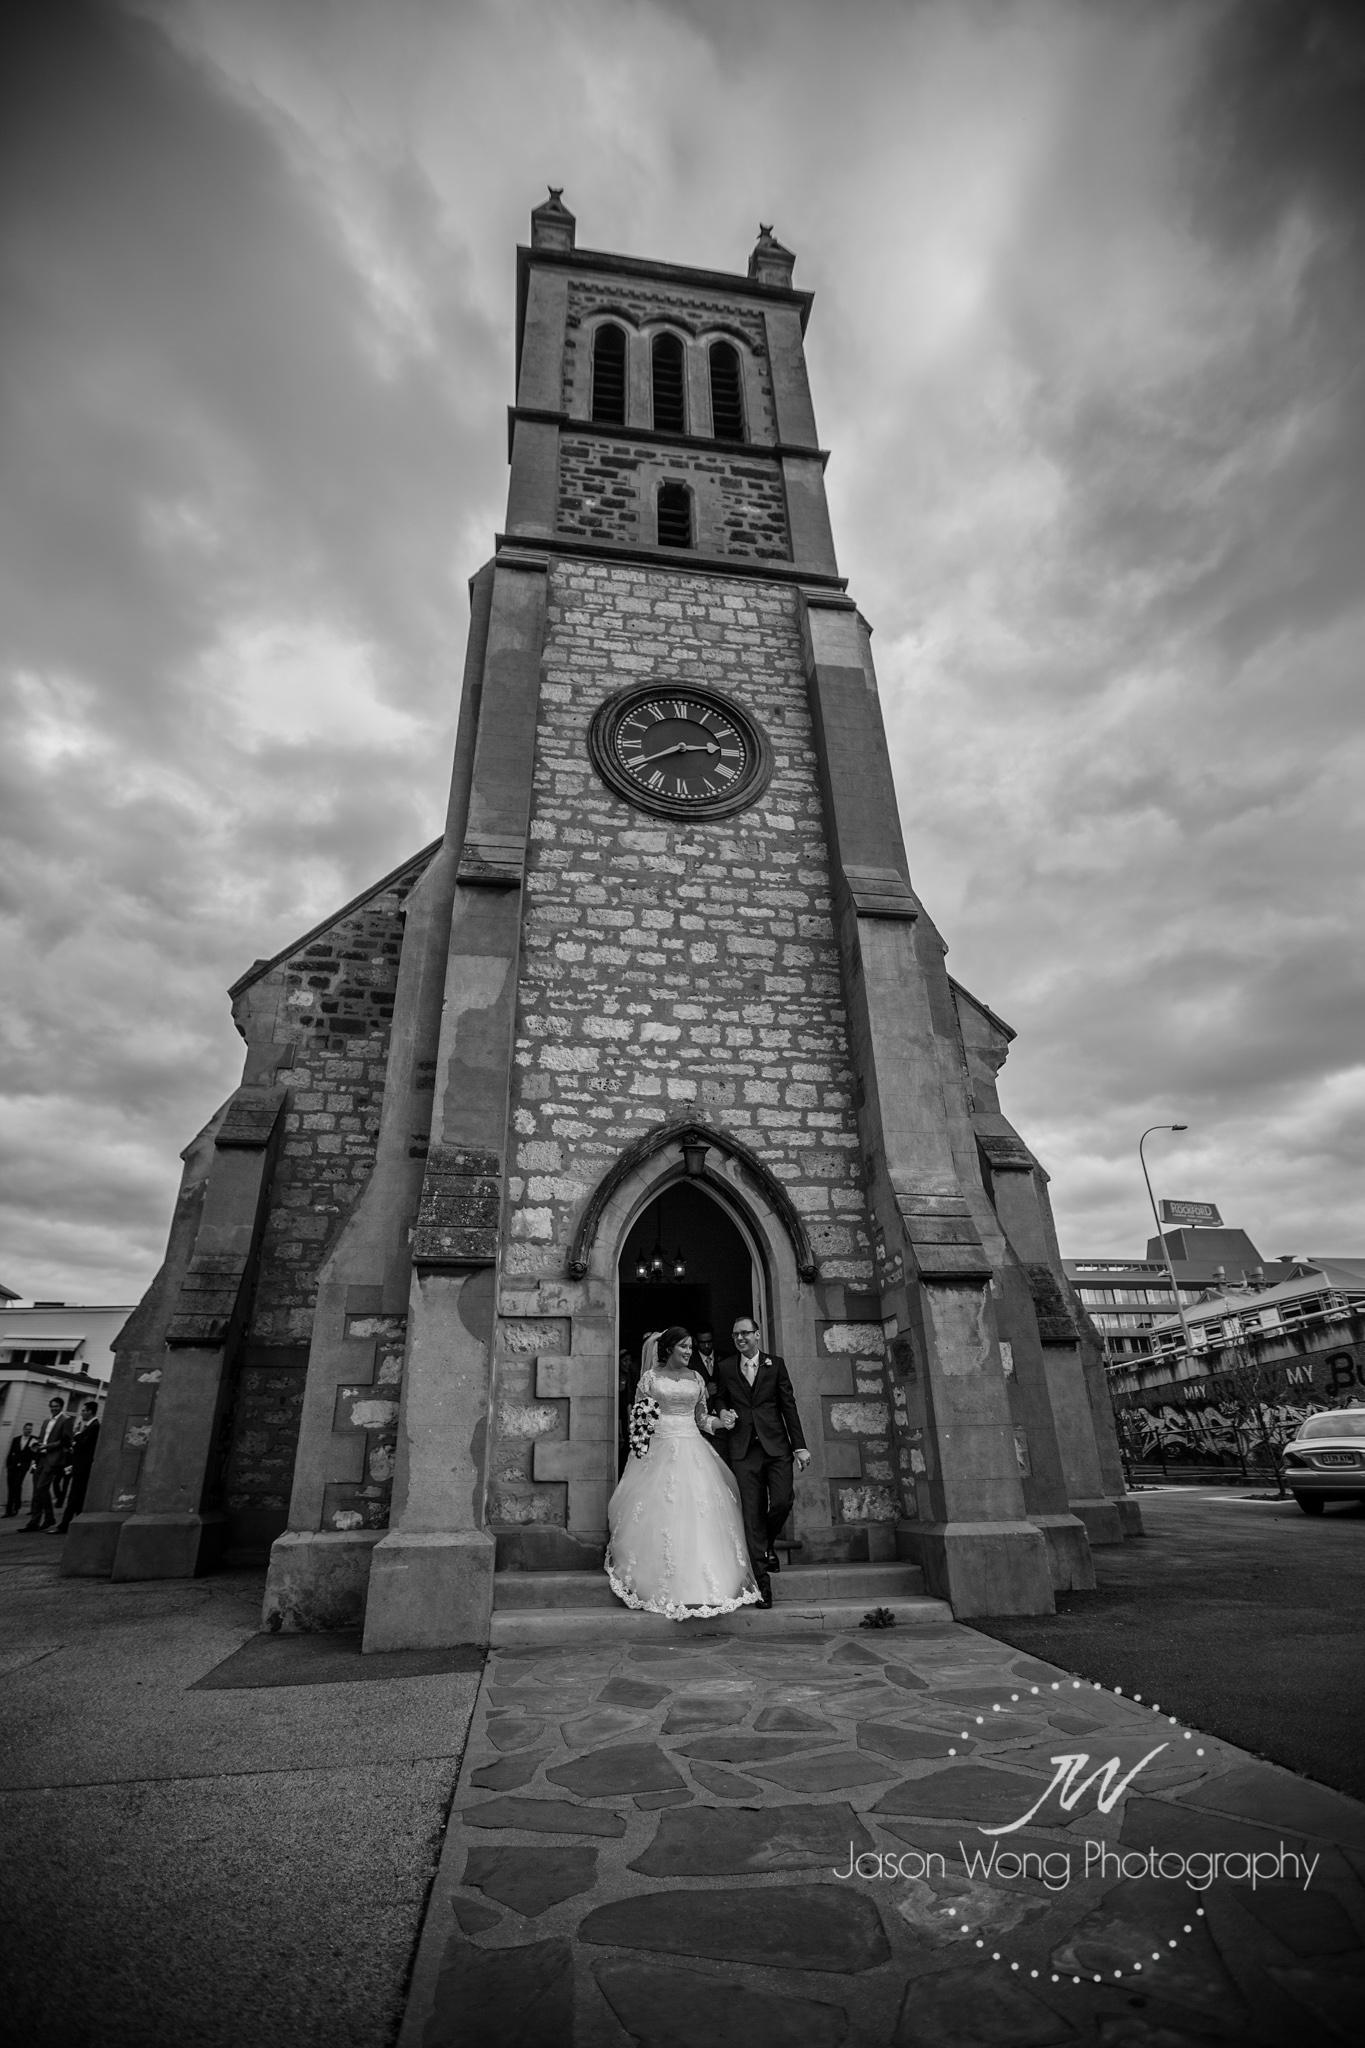 church-wedding-black-and-white.jpg